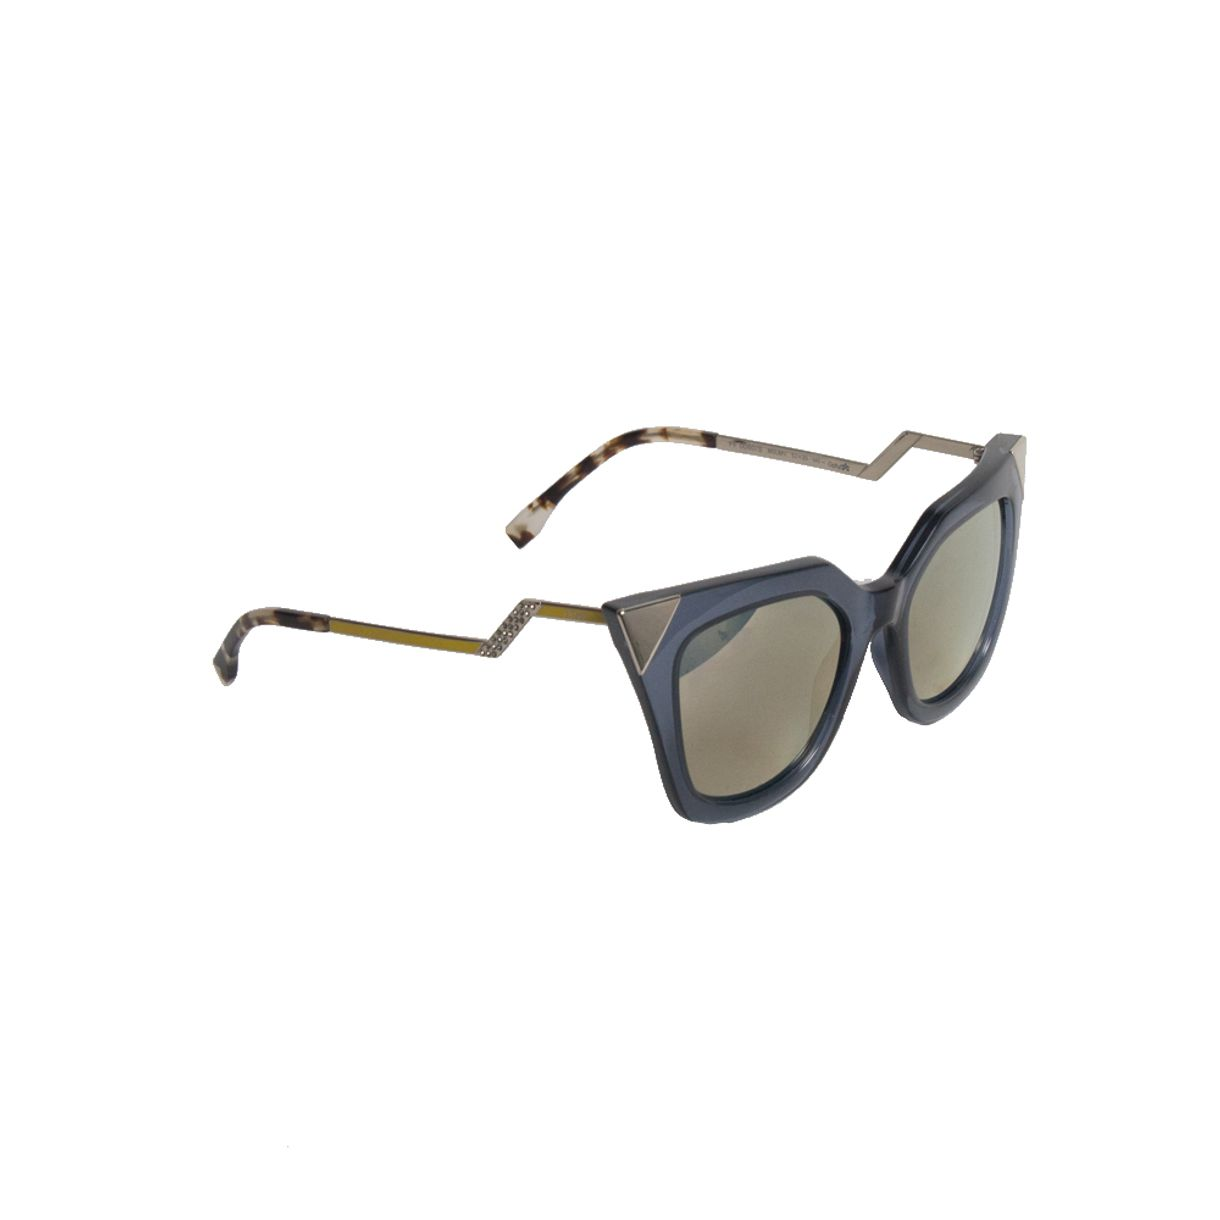 Oculos-Fendi-Iridia-Cat-Eye-with-Silver-Corners